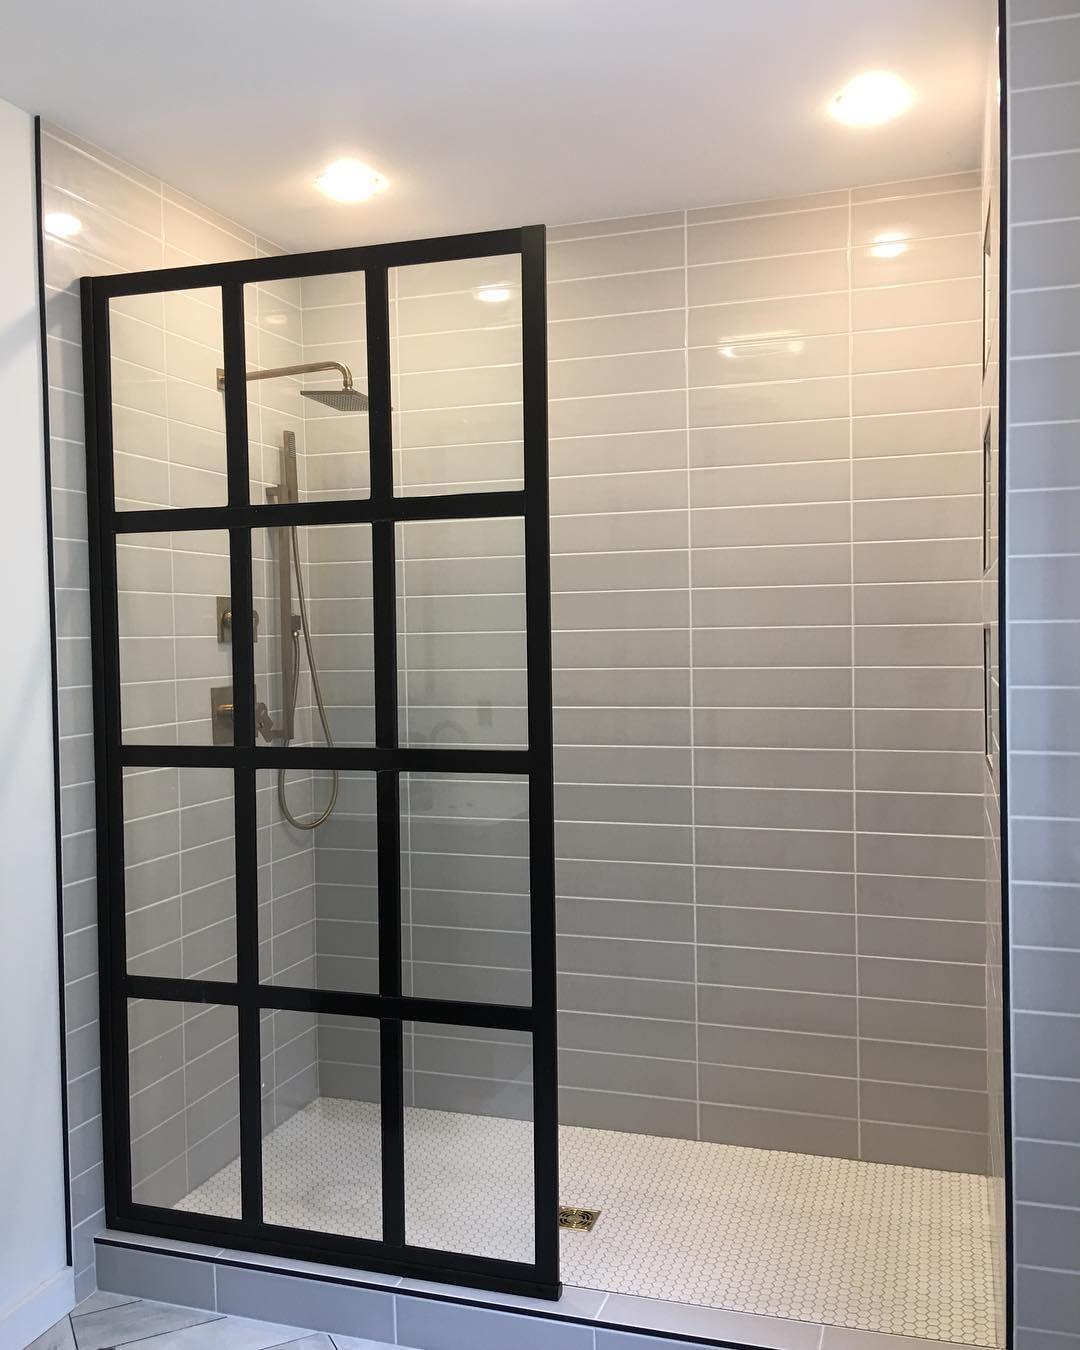 Gridscape Fixed Panel Shower Scren Found On Instagram